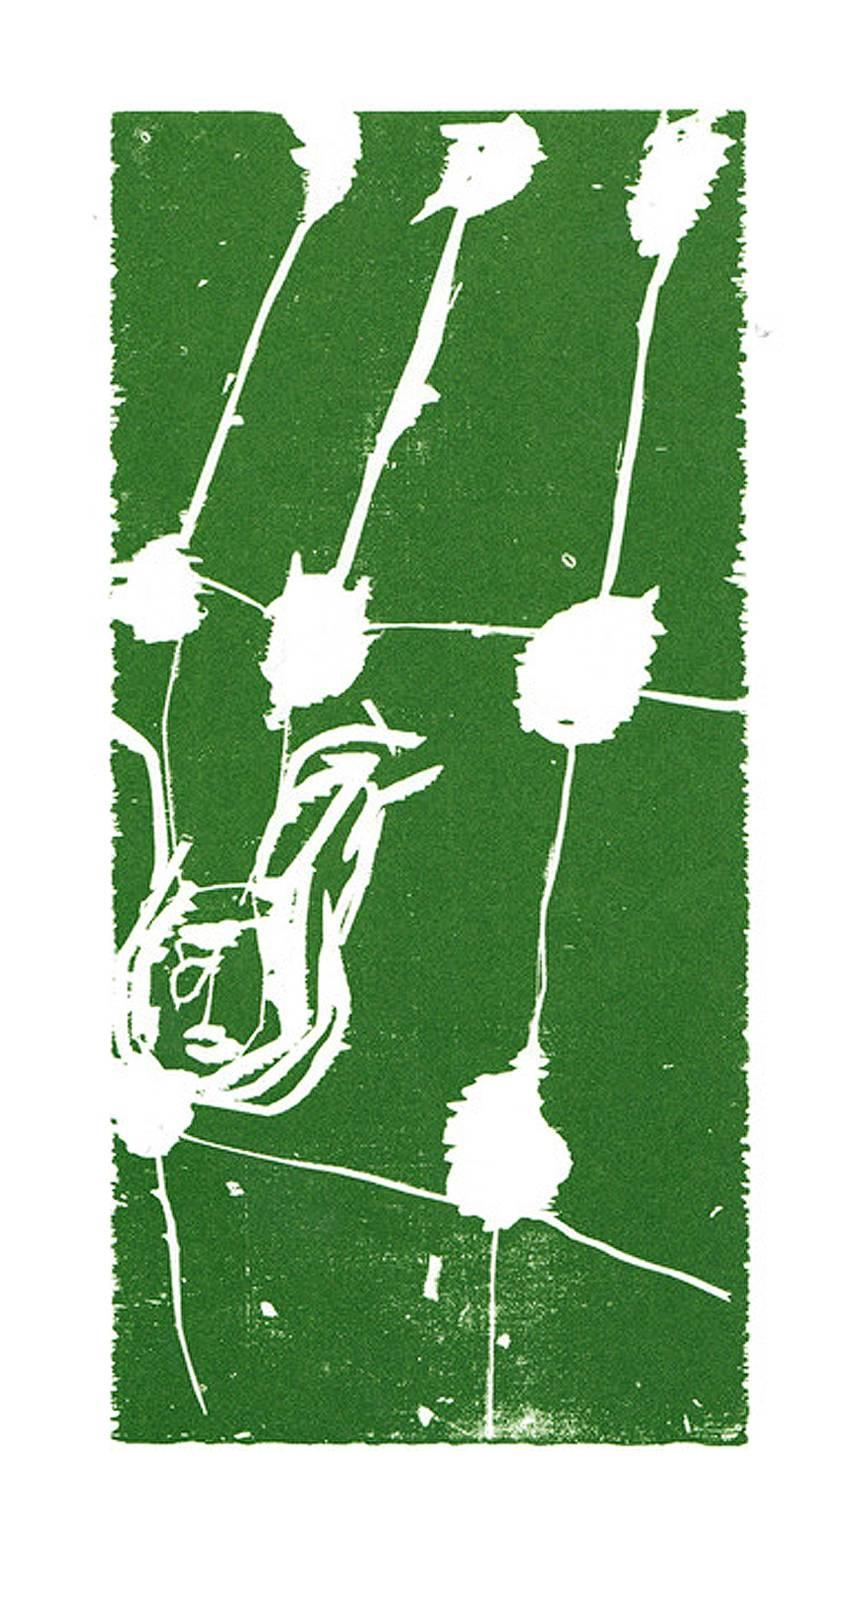 45 - Januar, Woodcut, Contemporary Art, Neo Expressionism, 20th Century